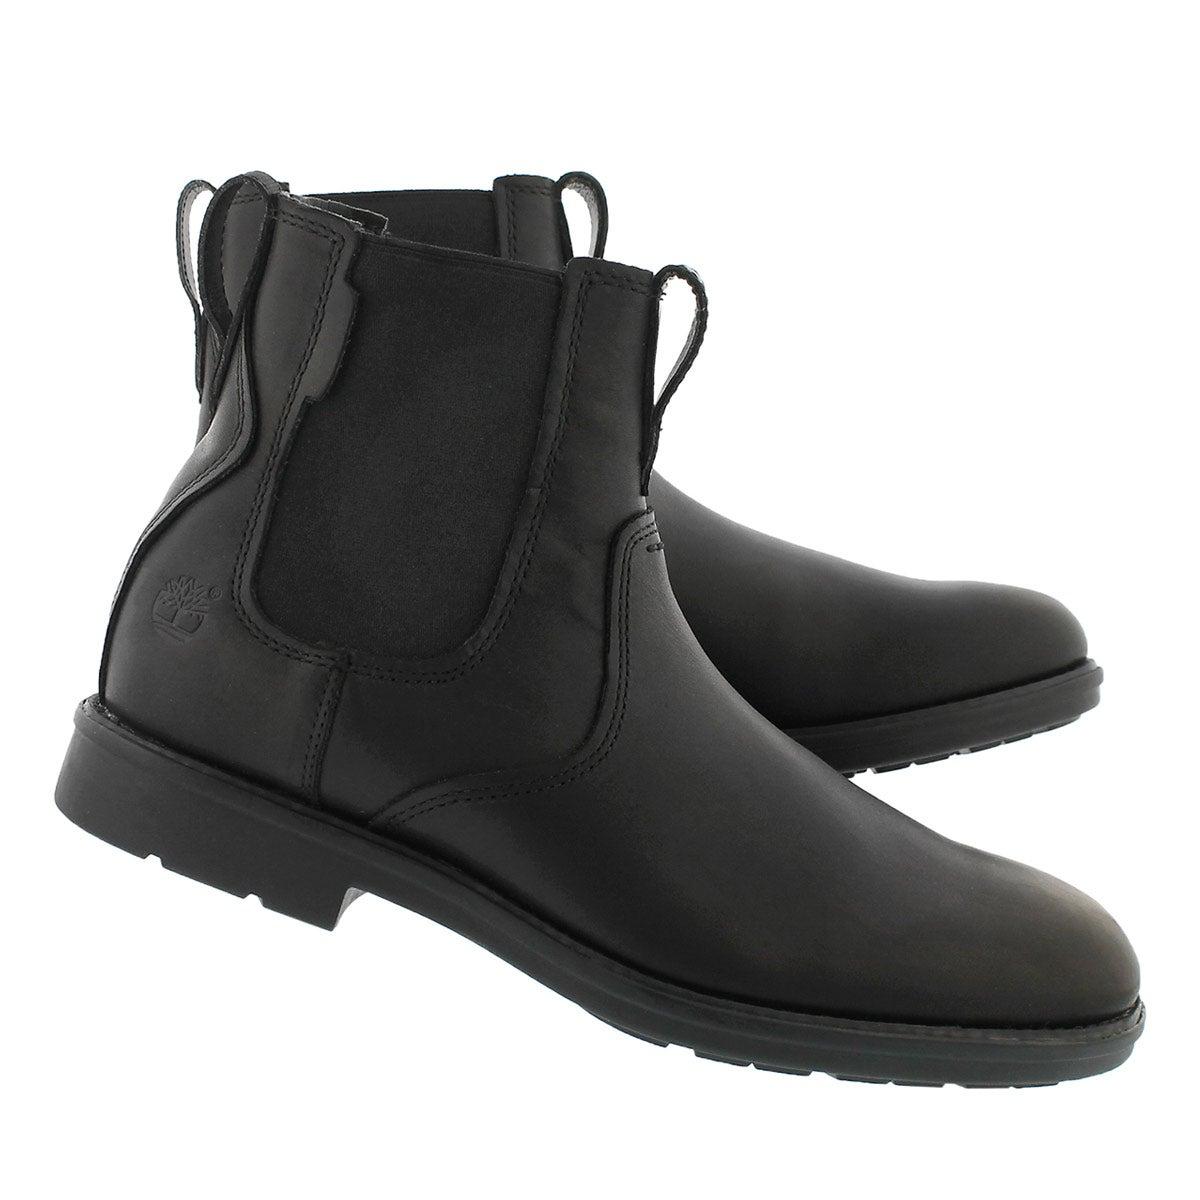 Mns Carter Notch blk chelsea boot- wide